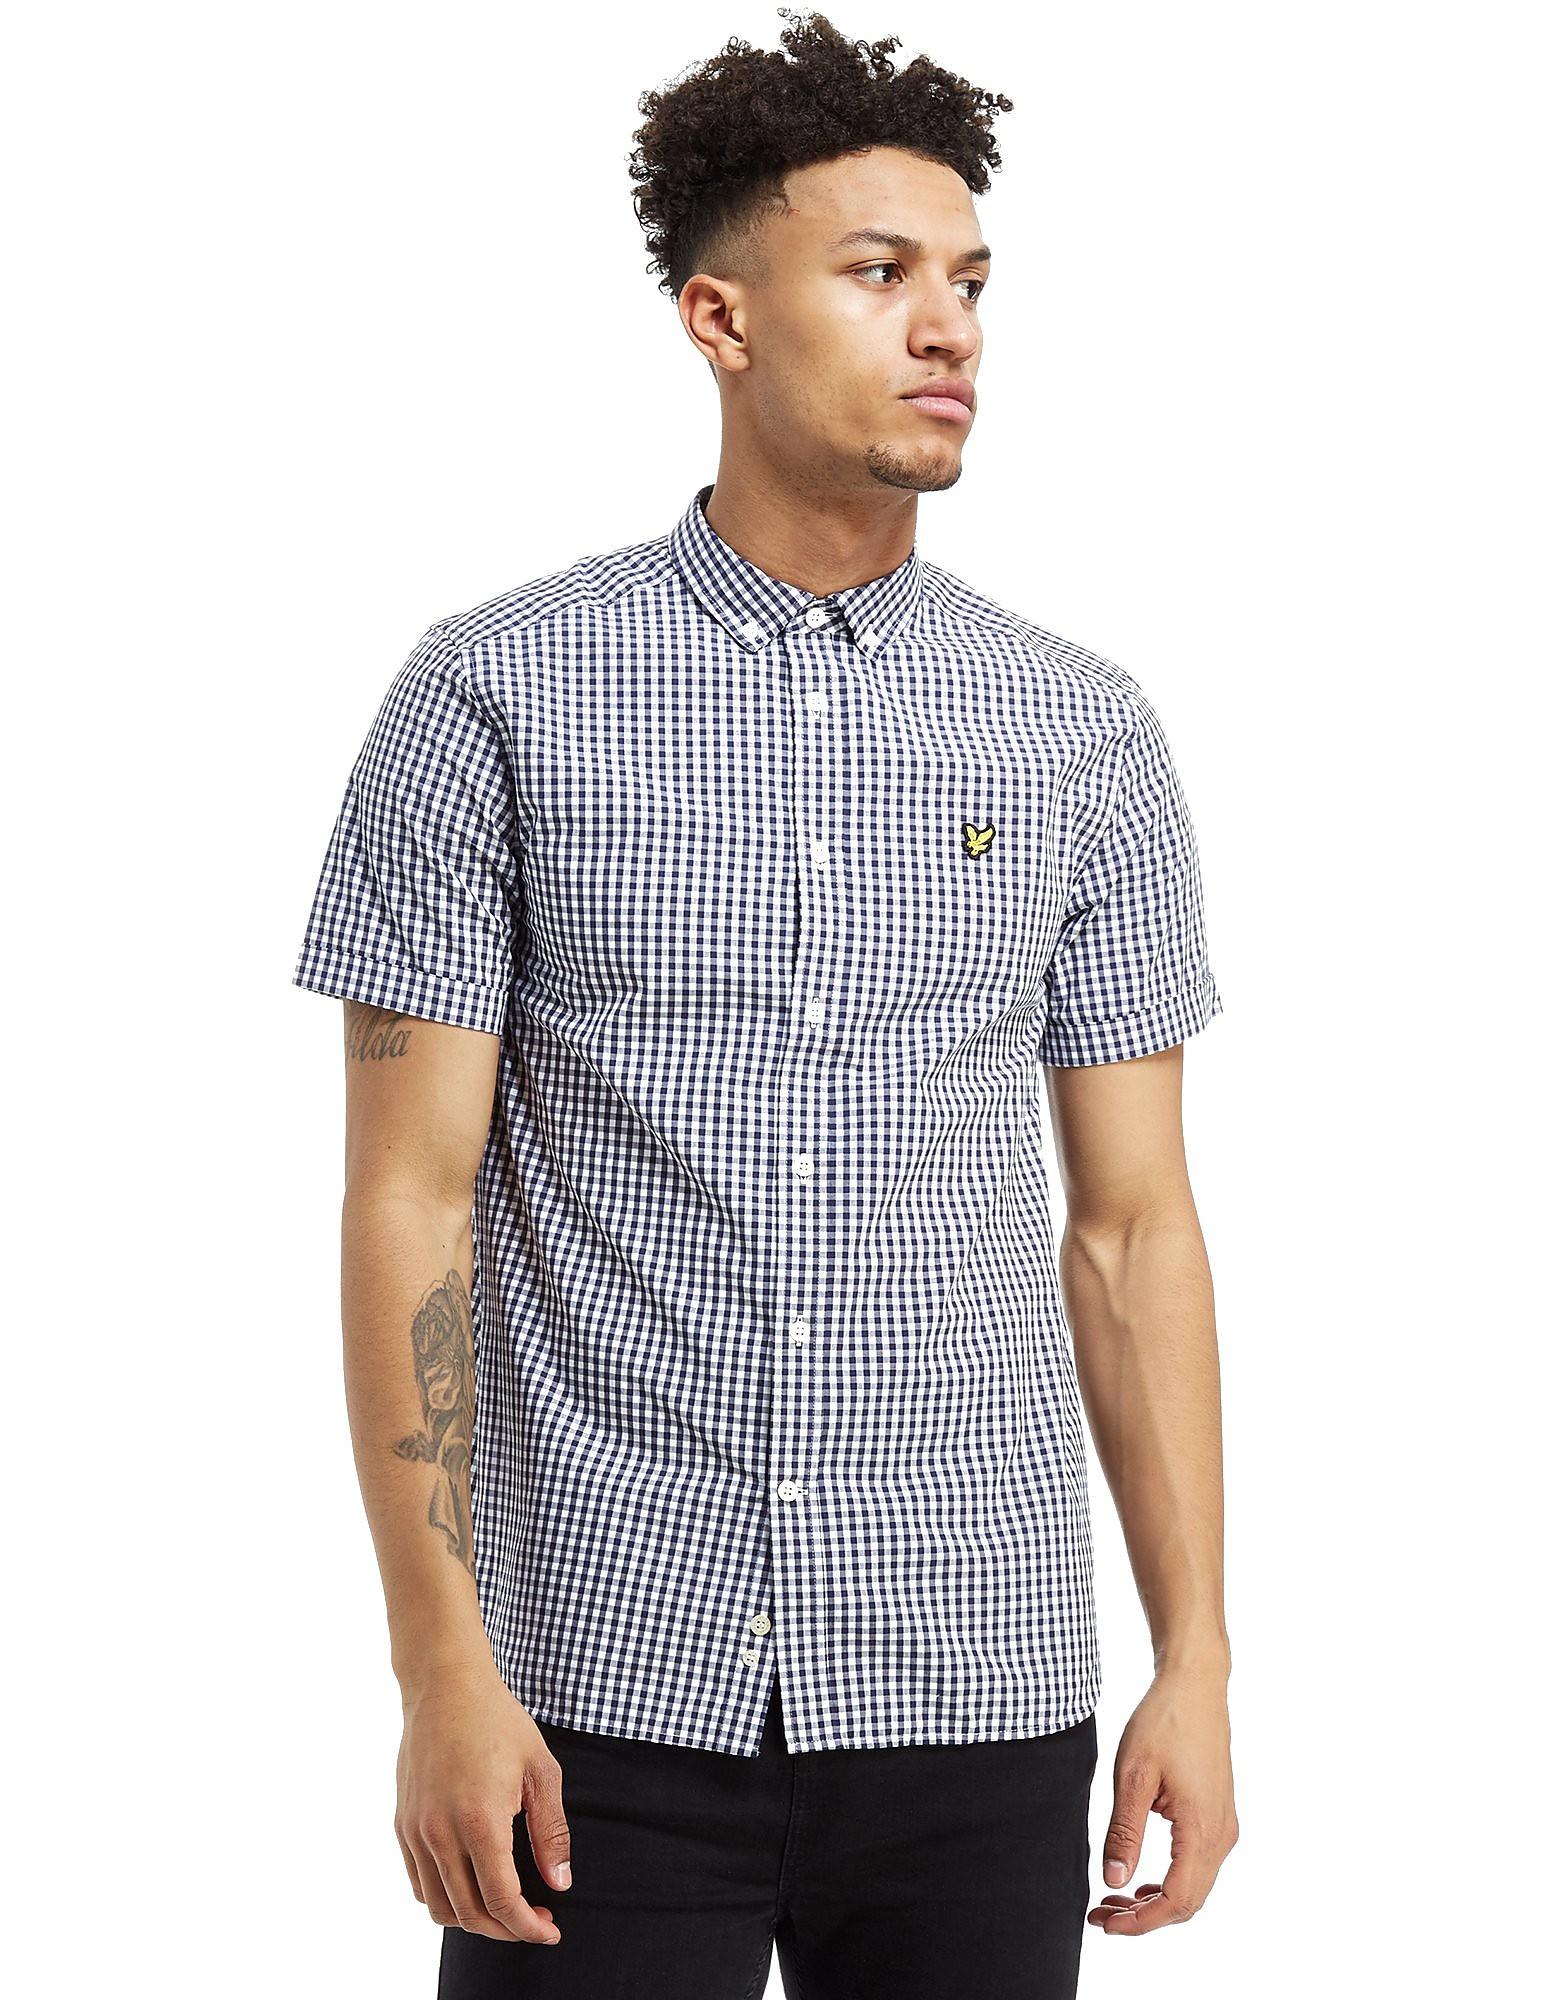 Lyle & Scott Short Sleeve Gingham Check Shirt